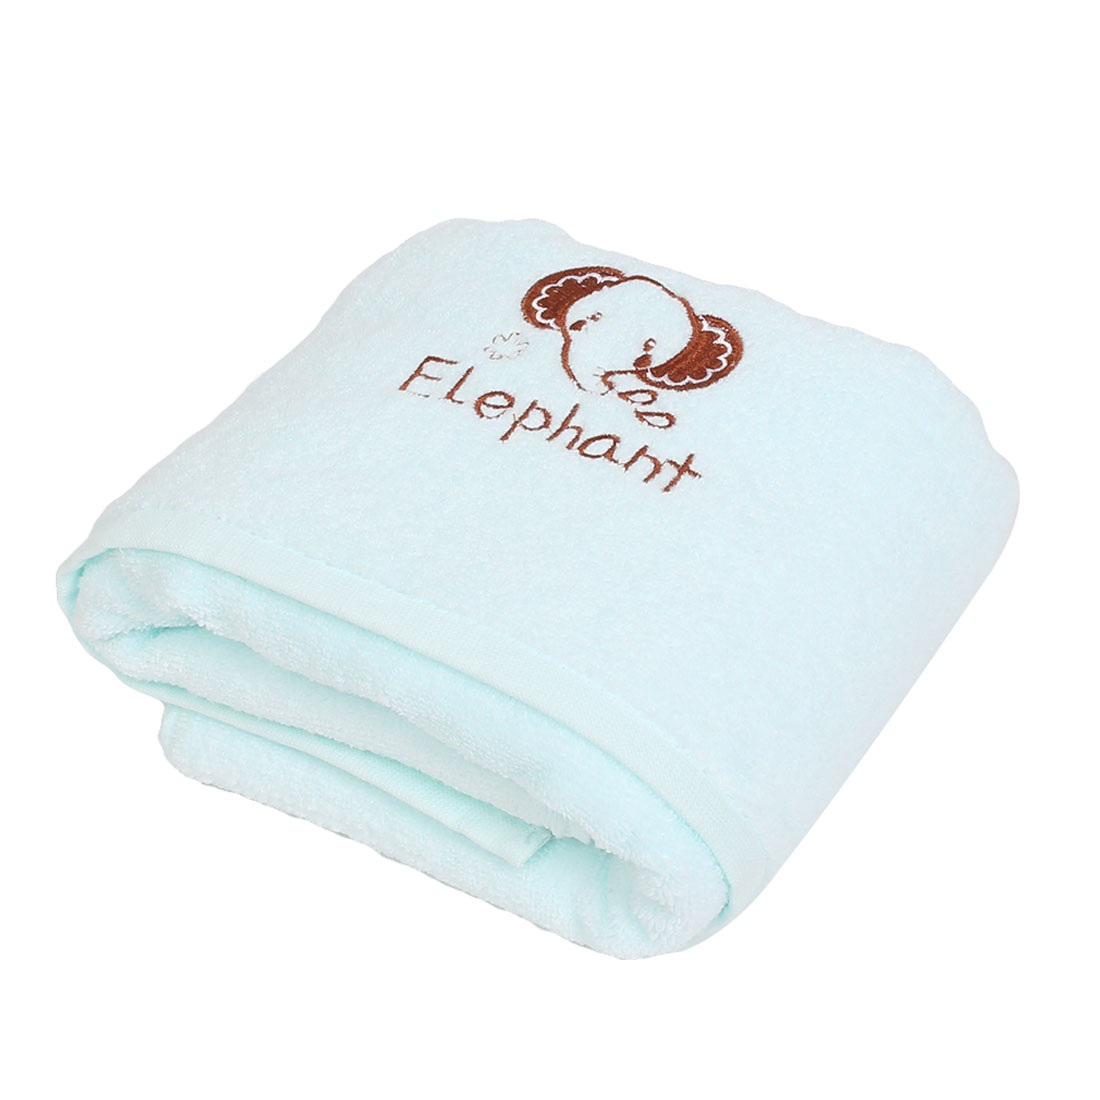 Travel Hotel Beach Shower Hair Drying Bath Towel Sheet Light Blue 120 x 60cm